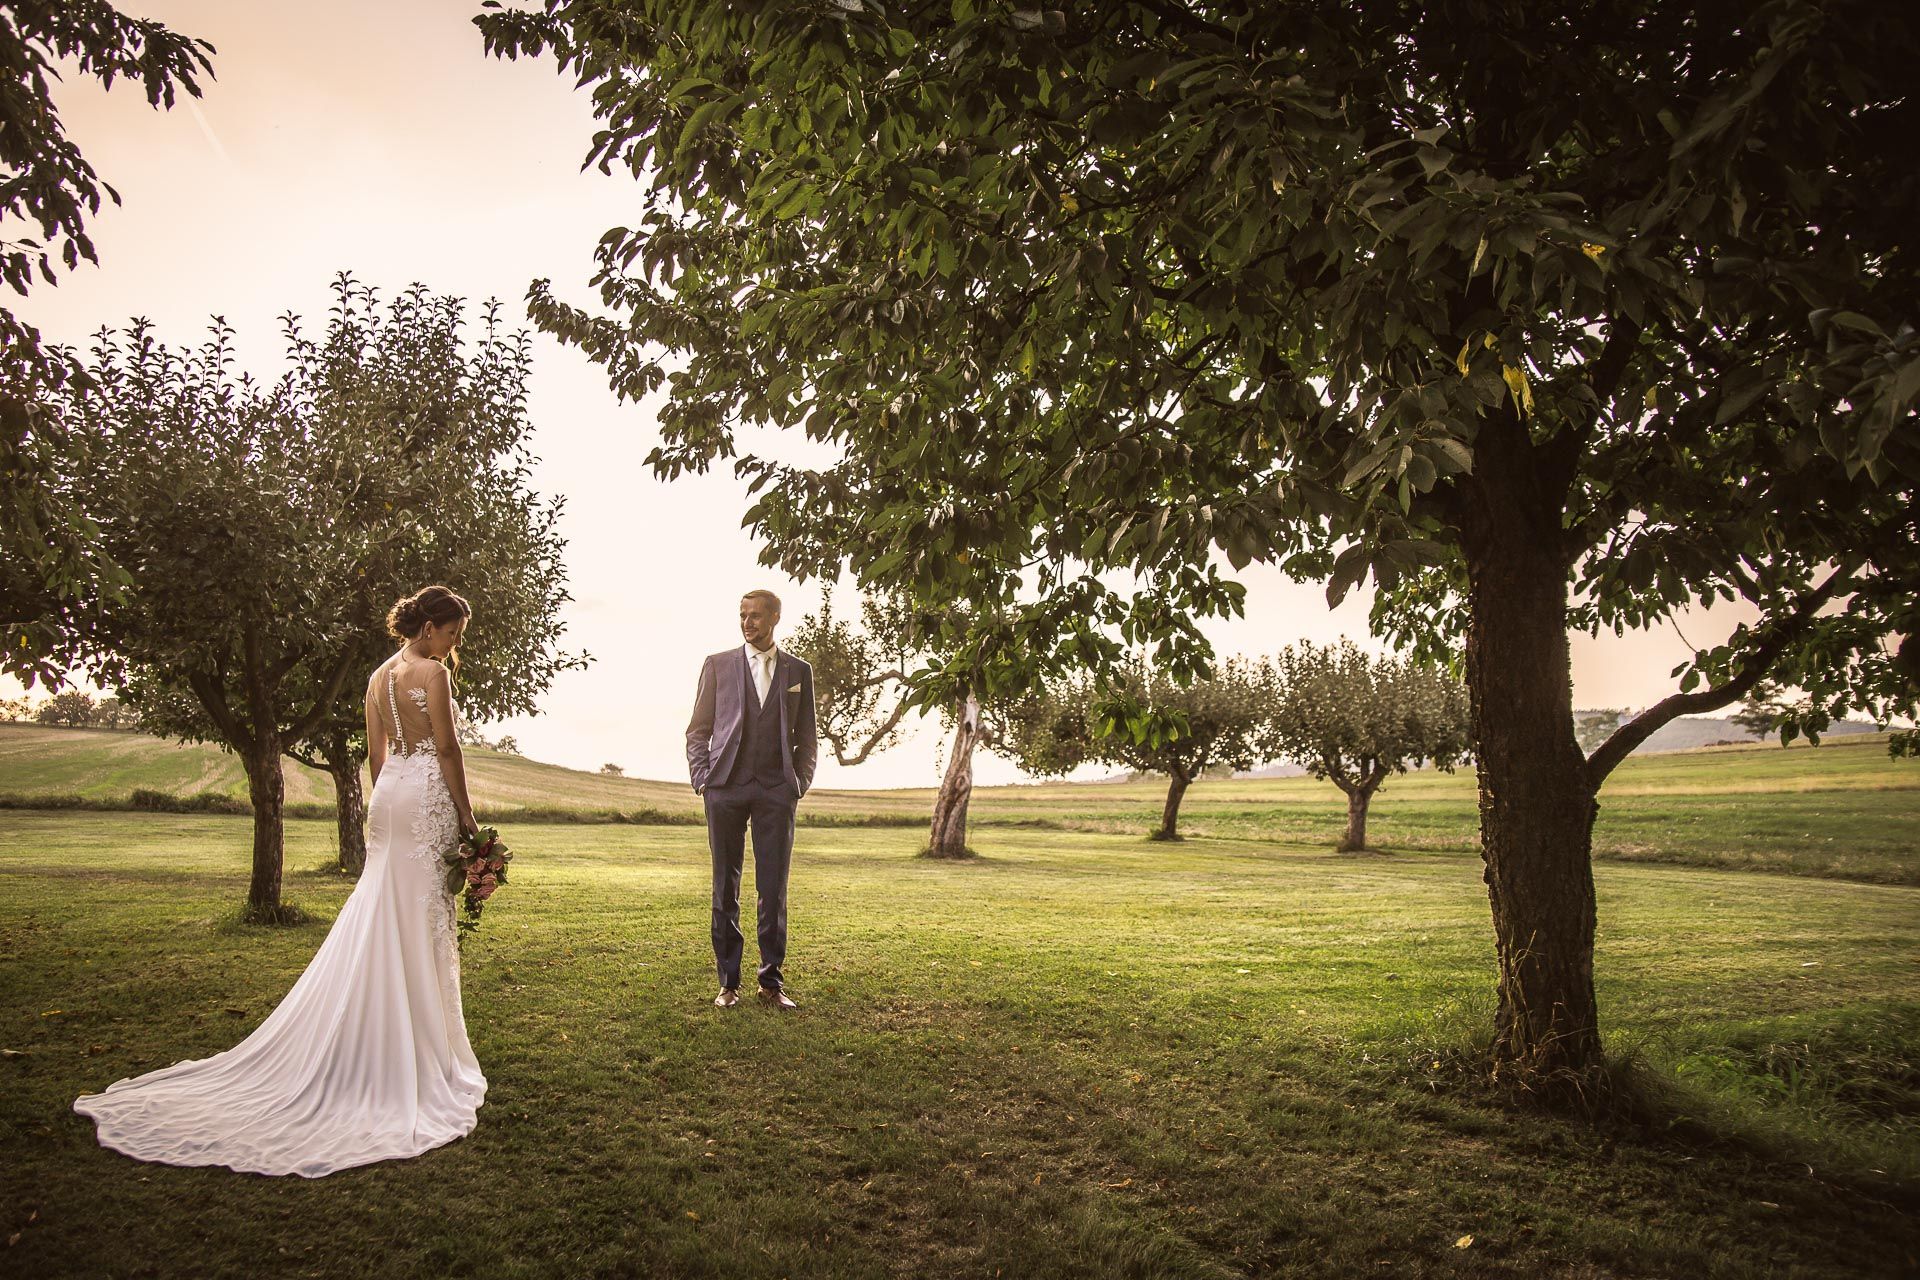 svatební-fotograf-wedding-svatebni-video-orlík-vltava-kostel-statek-stodola-boho-svatba-Beautyfoto-541